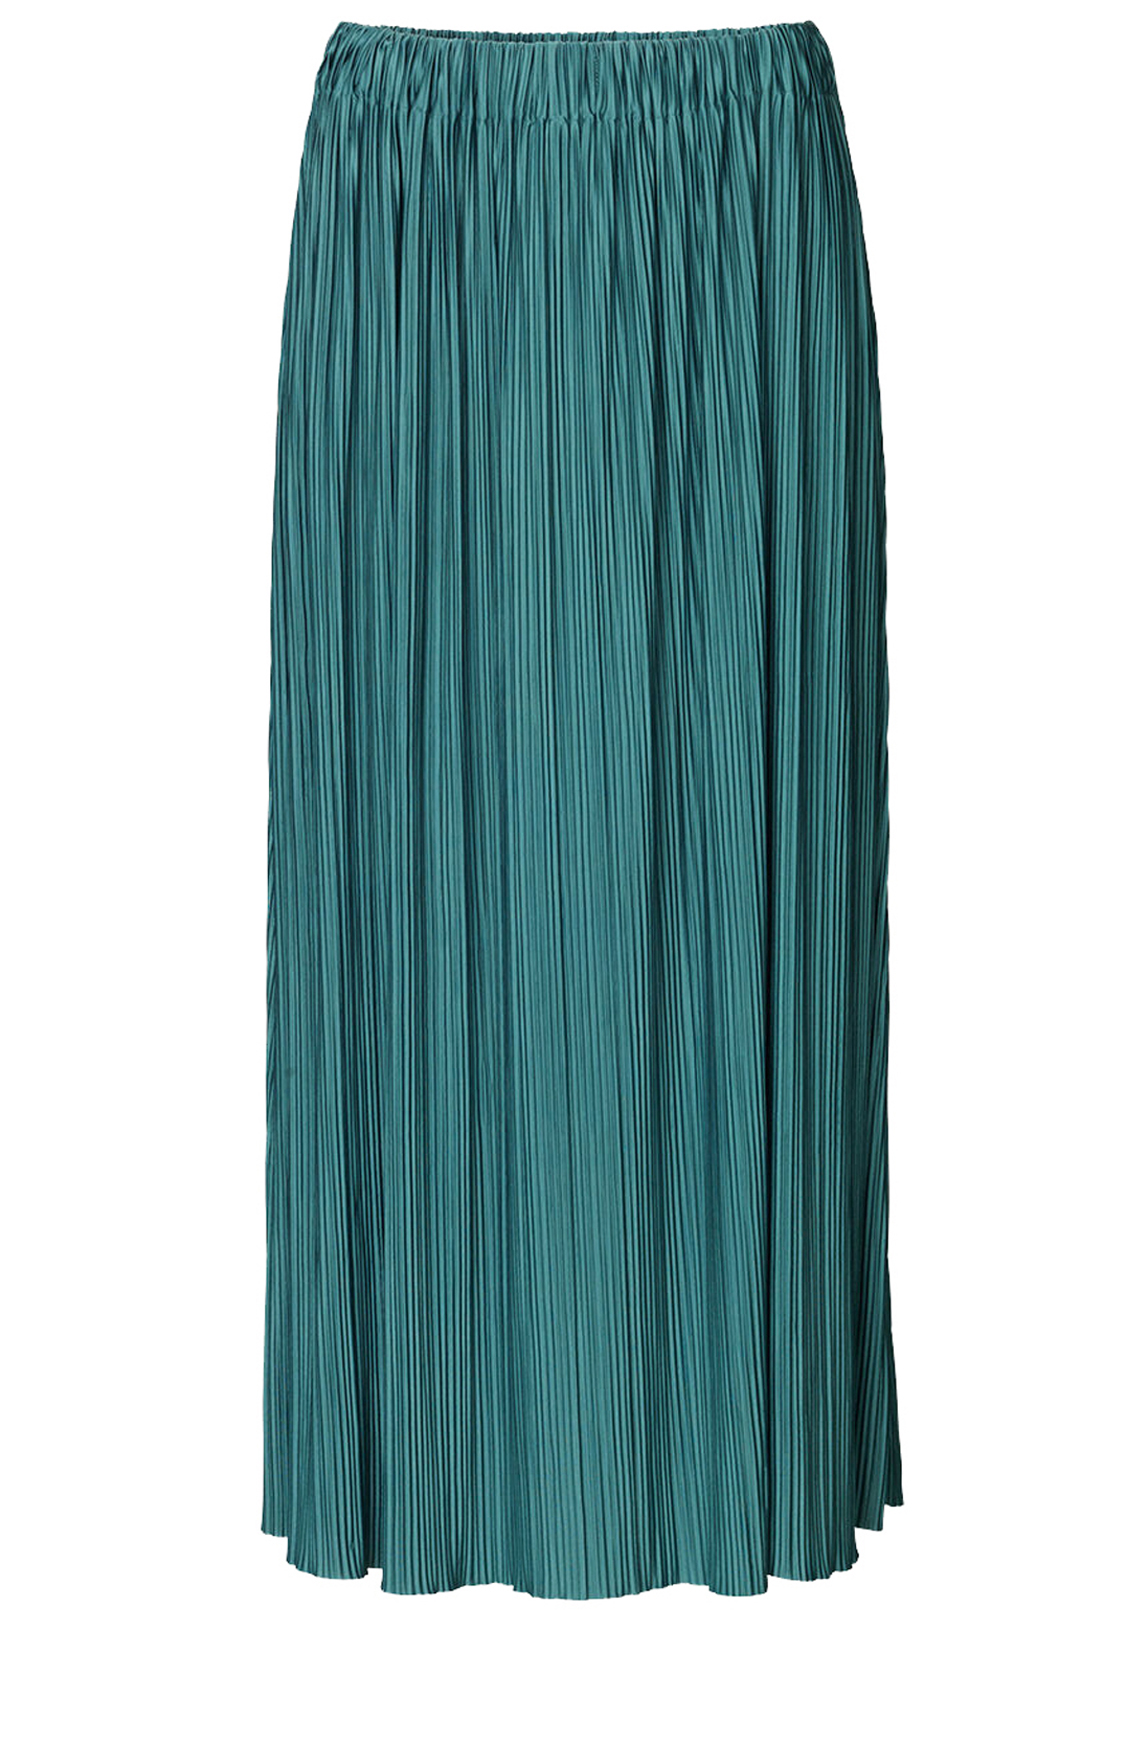 Samsoe Samsoe Dames Uma plissé rok groen